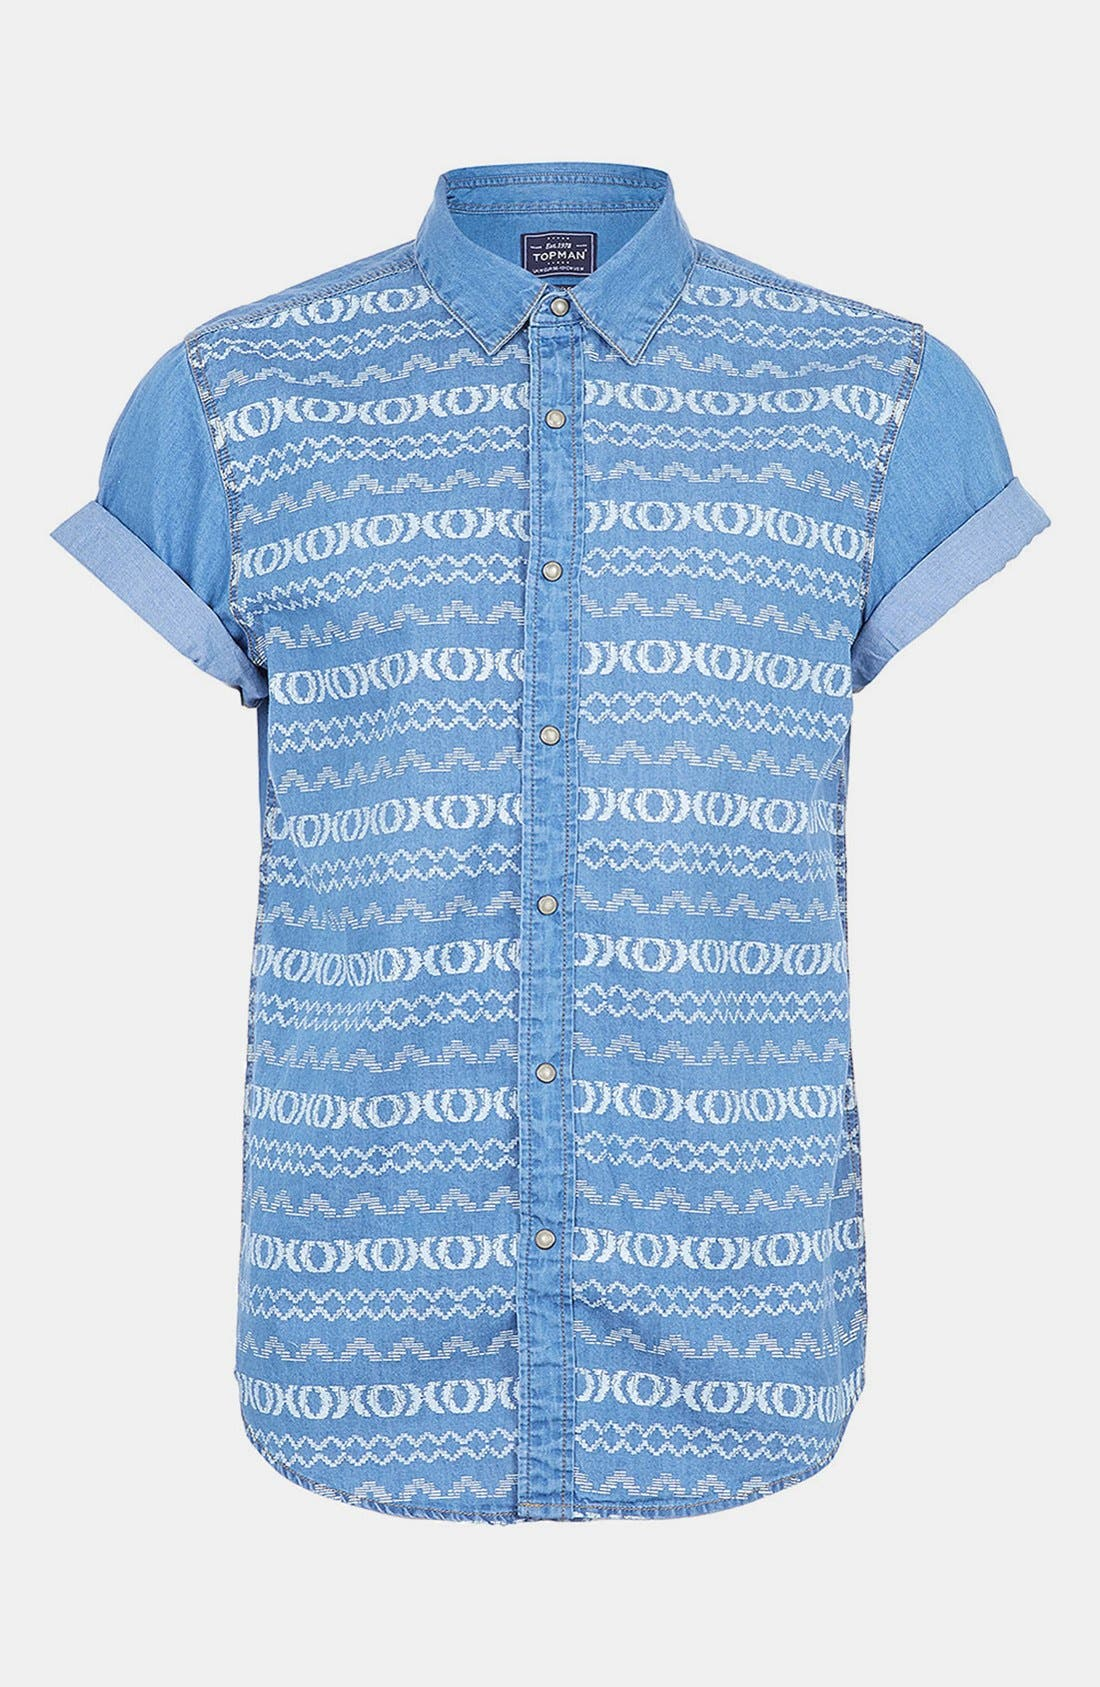 Main Image - Topman Short Sleeve Pattern Print Denim Shirt